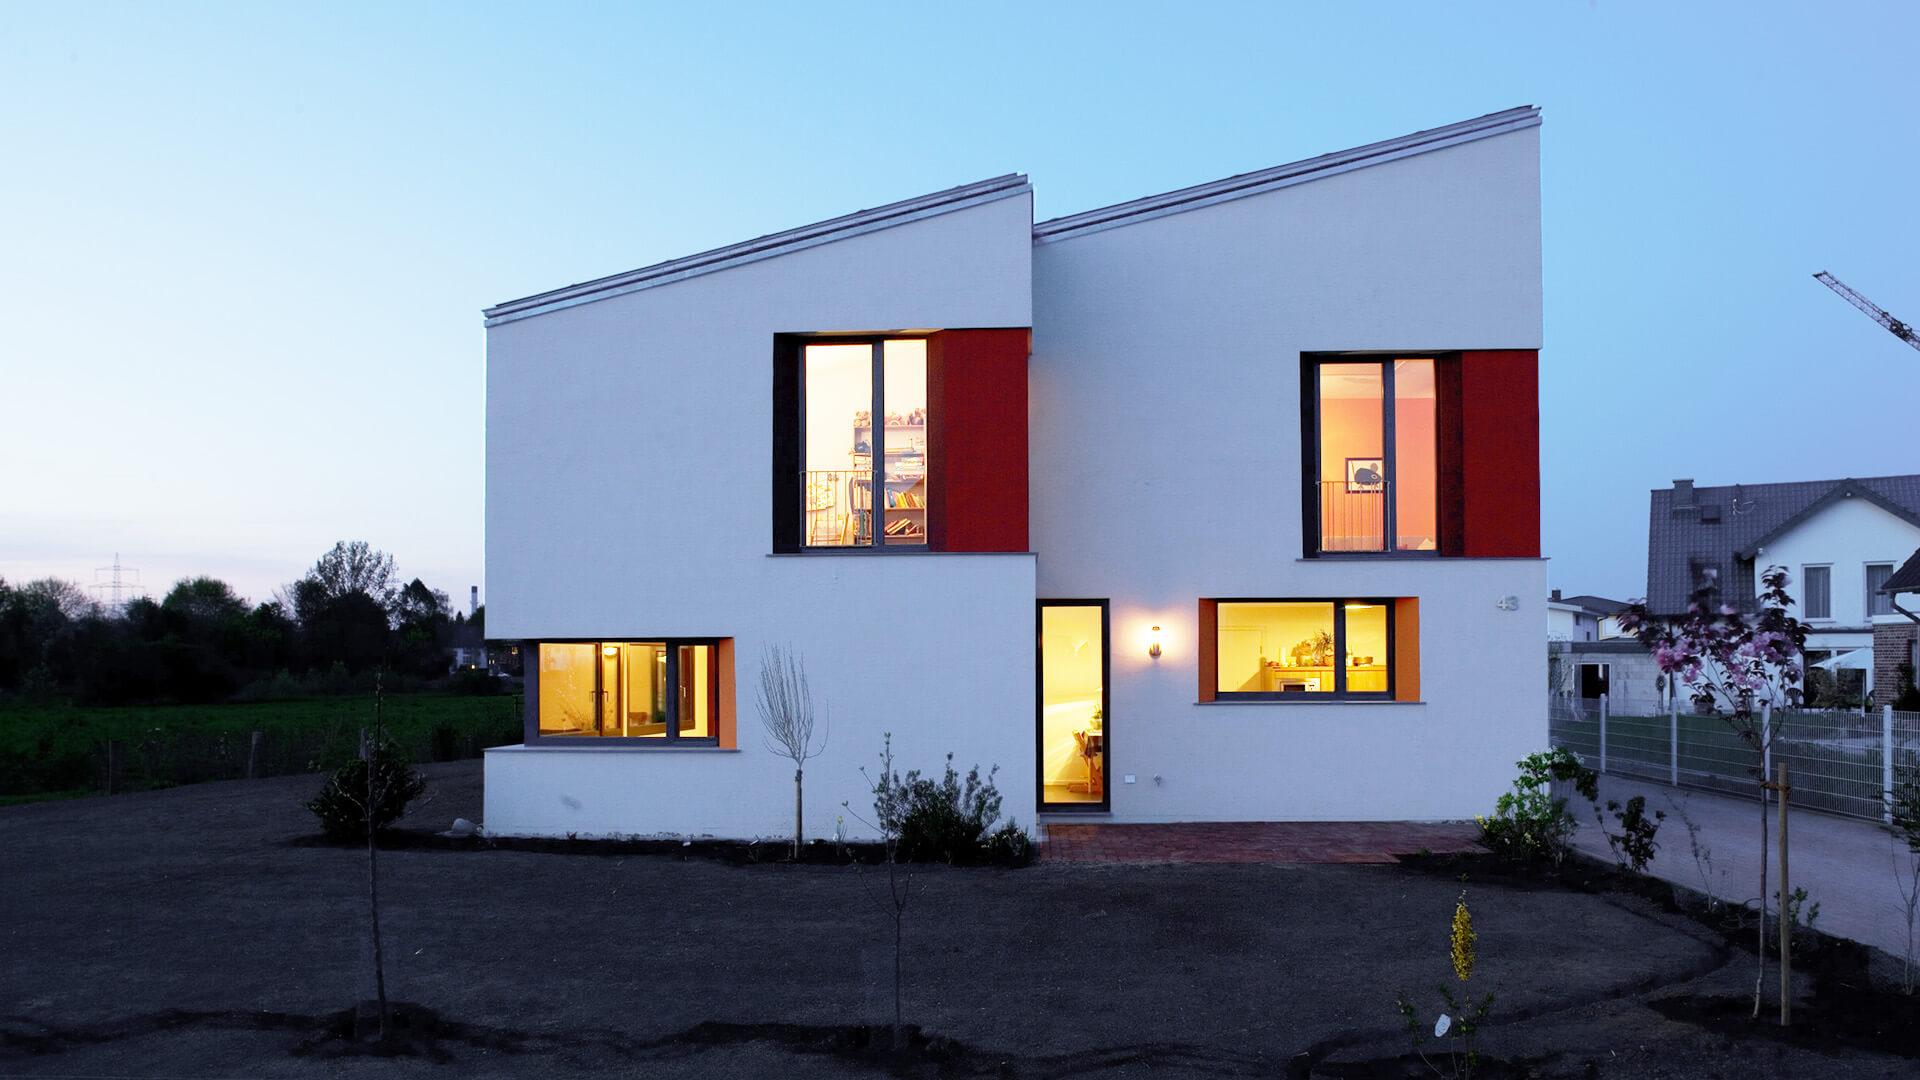 haus ha individuelles einfamilienhaus in duisburg duda. Black Bedroom Furniture Sets. Home Design Ideas